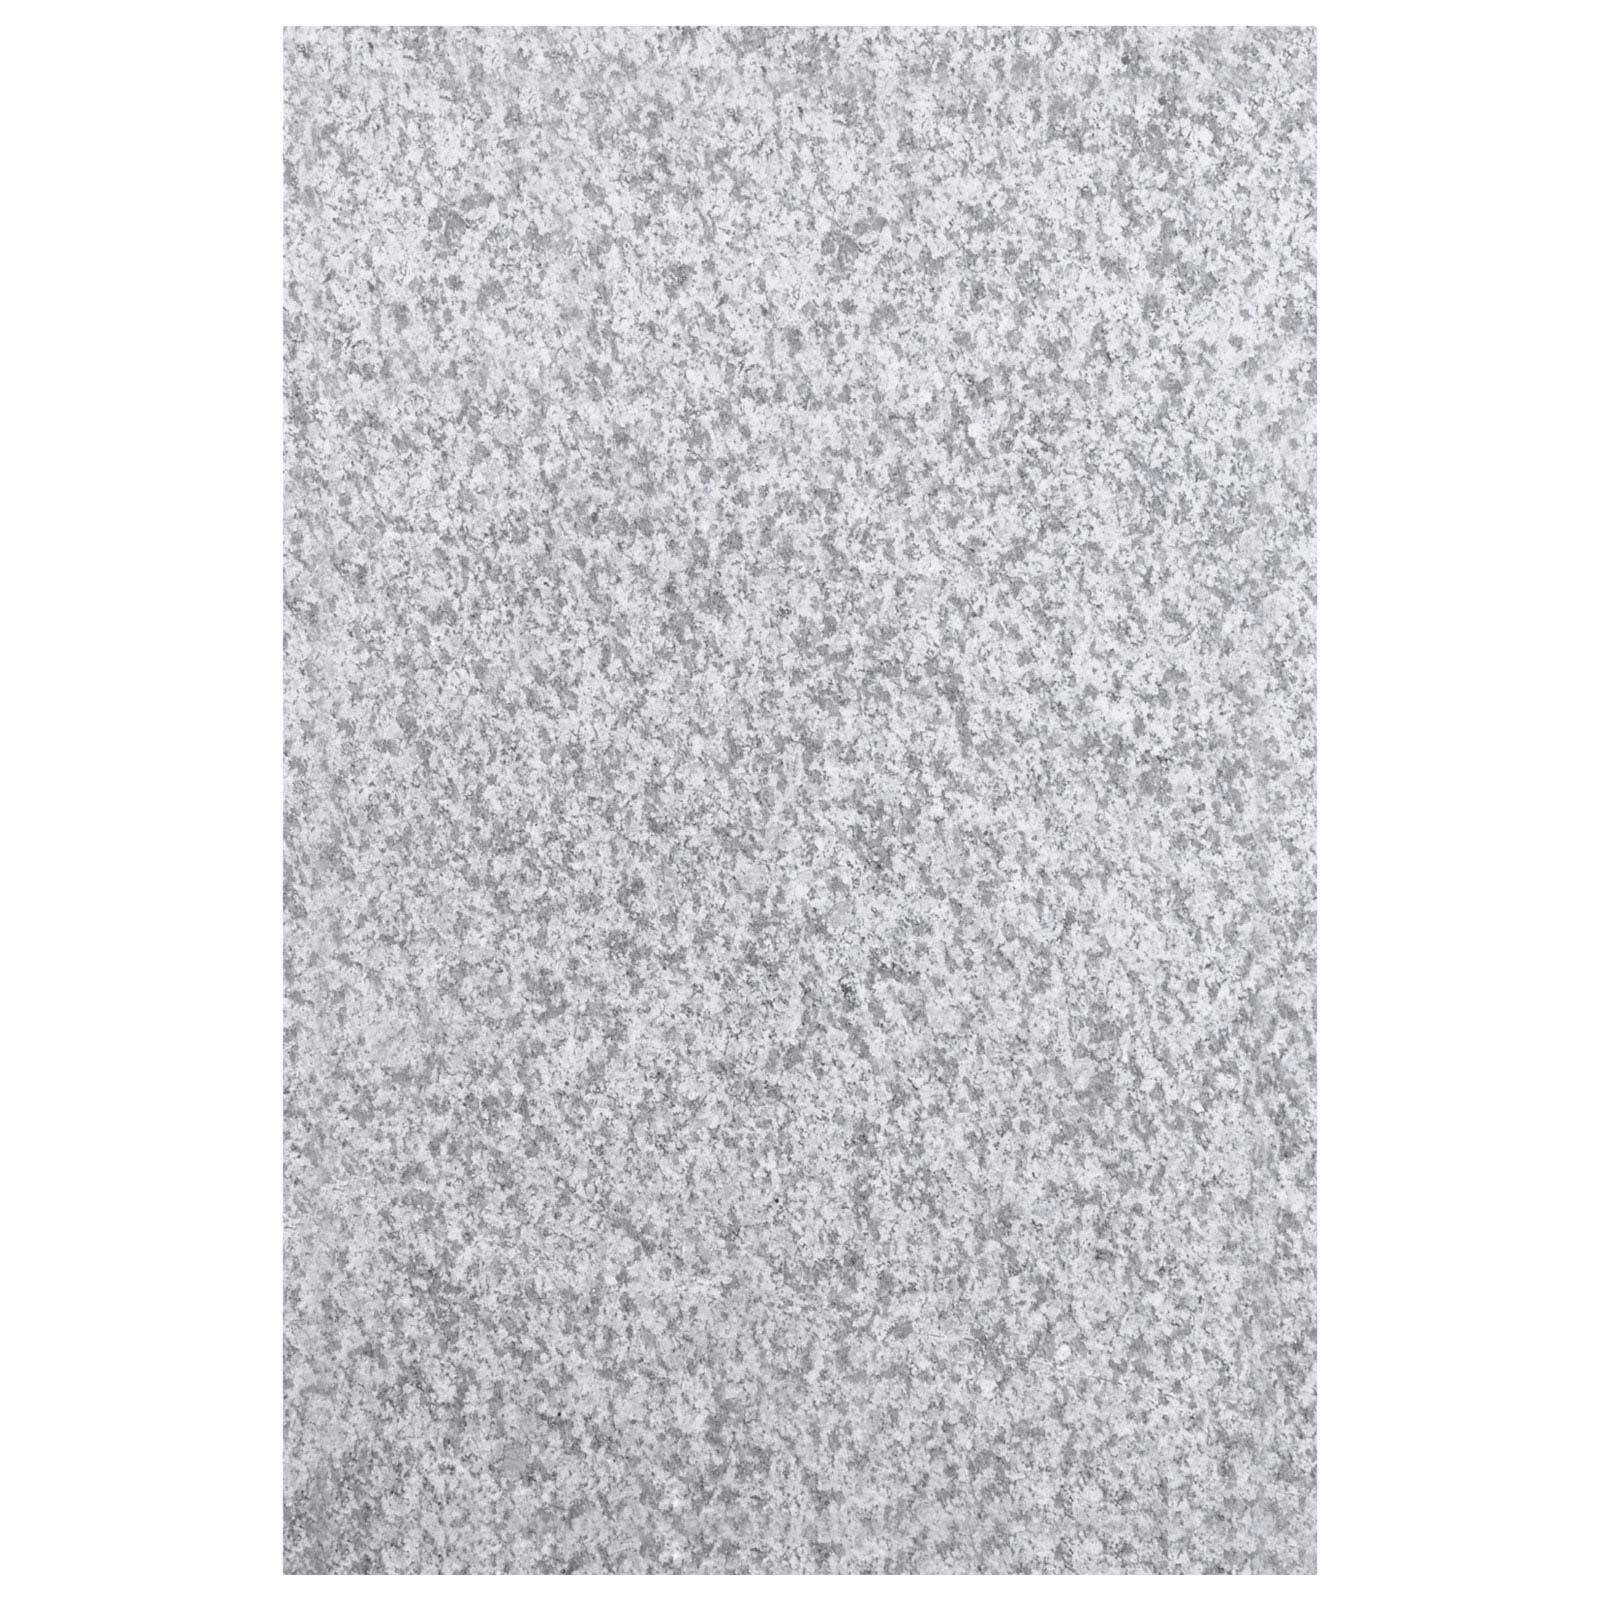 grey granit 60x40x3 cm struktura capitile. Black Bedroom Furniture Sets. Home Design Ideas